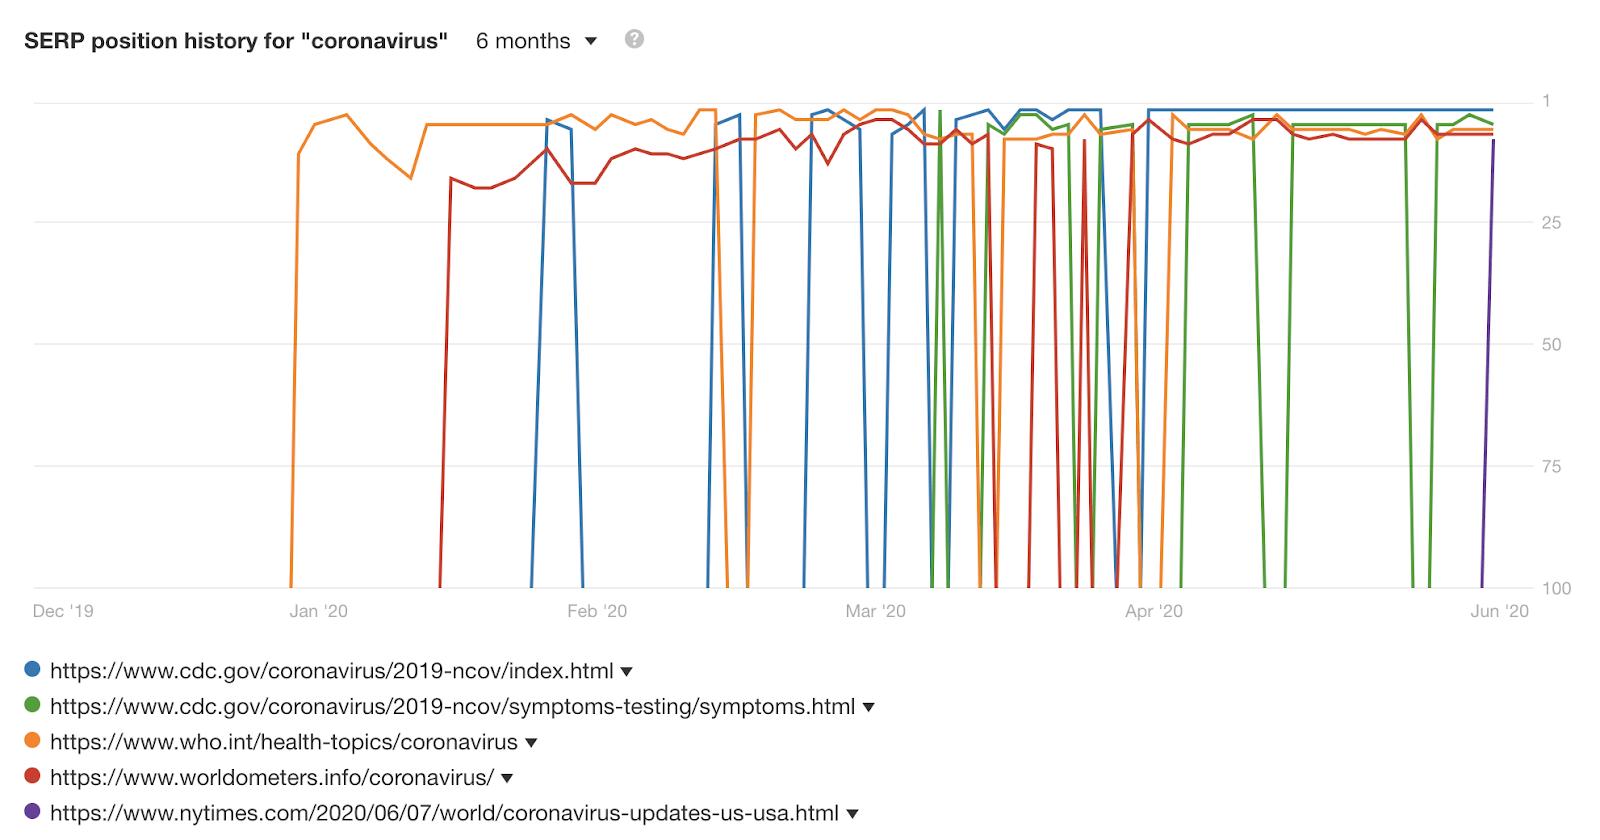 serp history graph 1